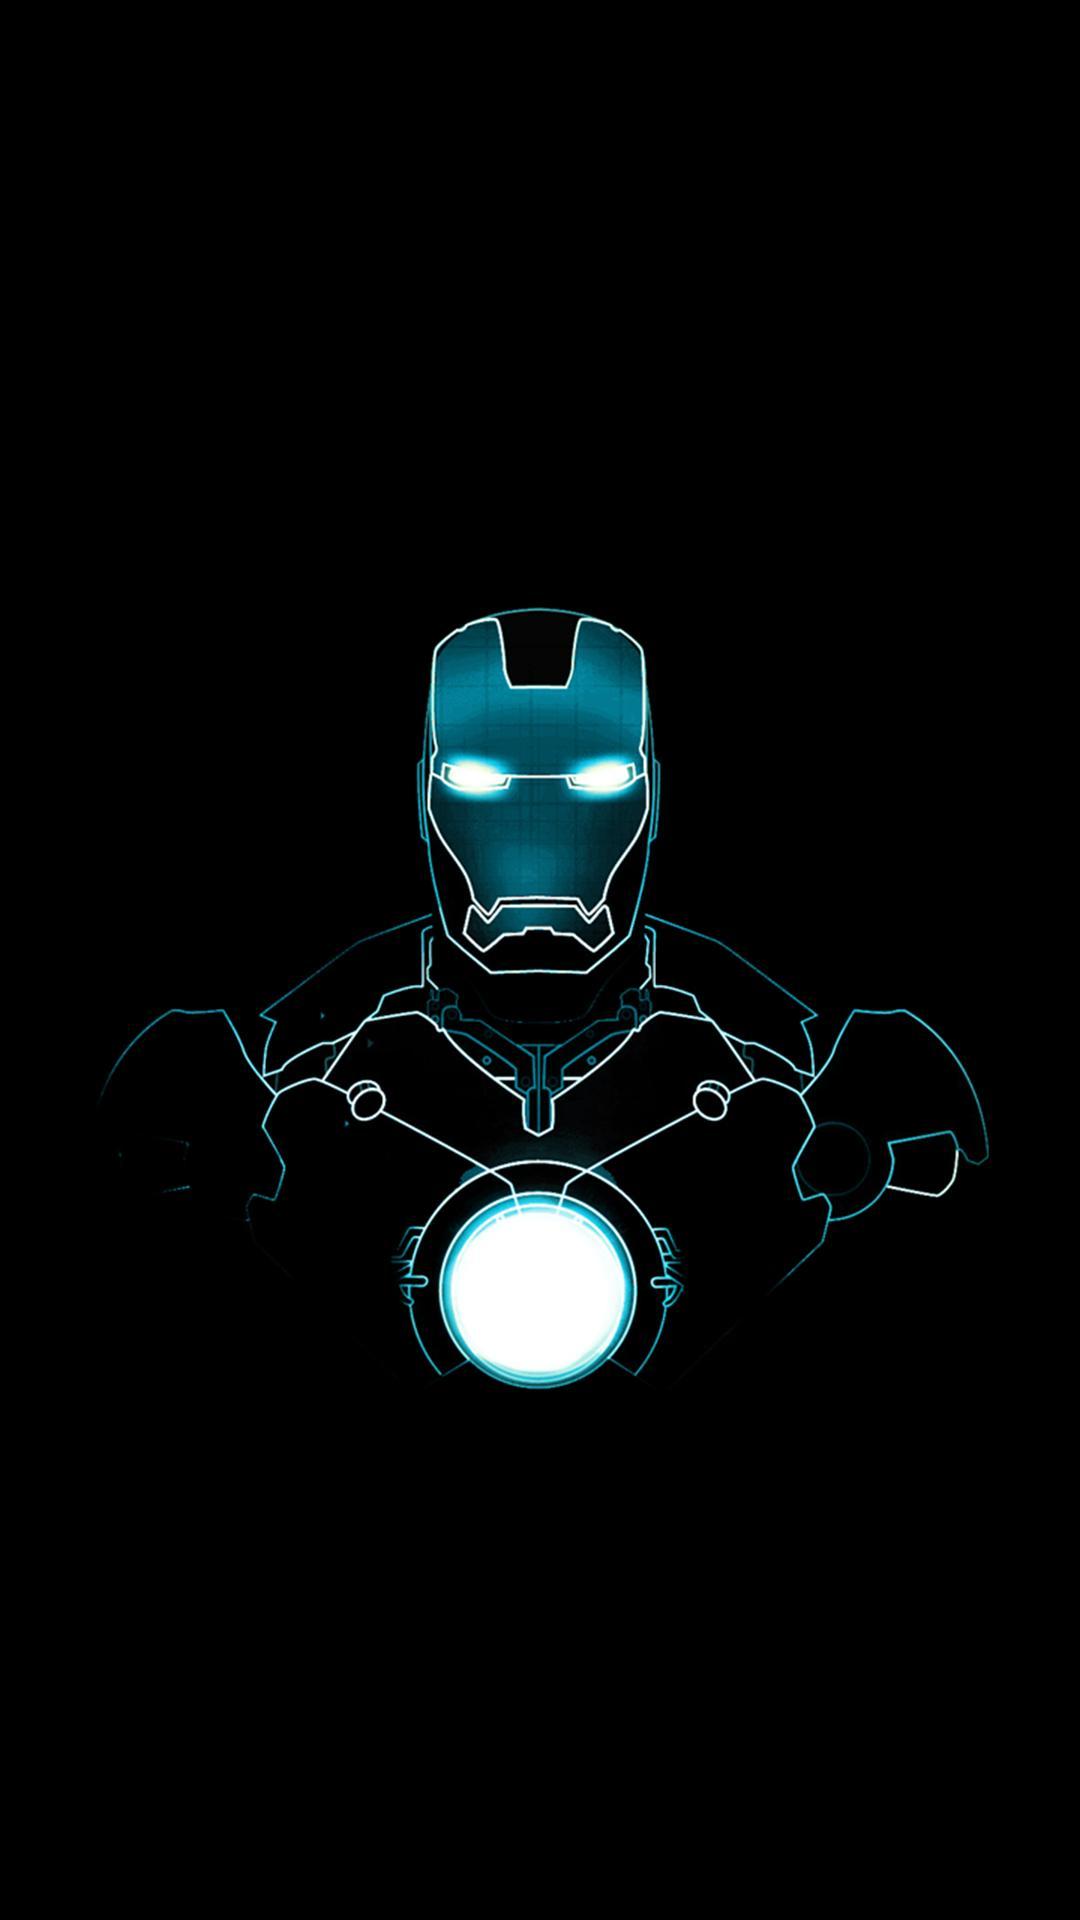 Iron Man Suit | 1080 x 1920 | Download | Close